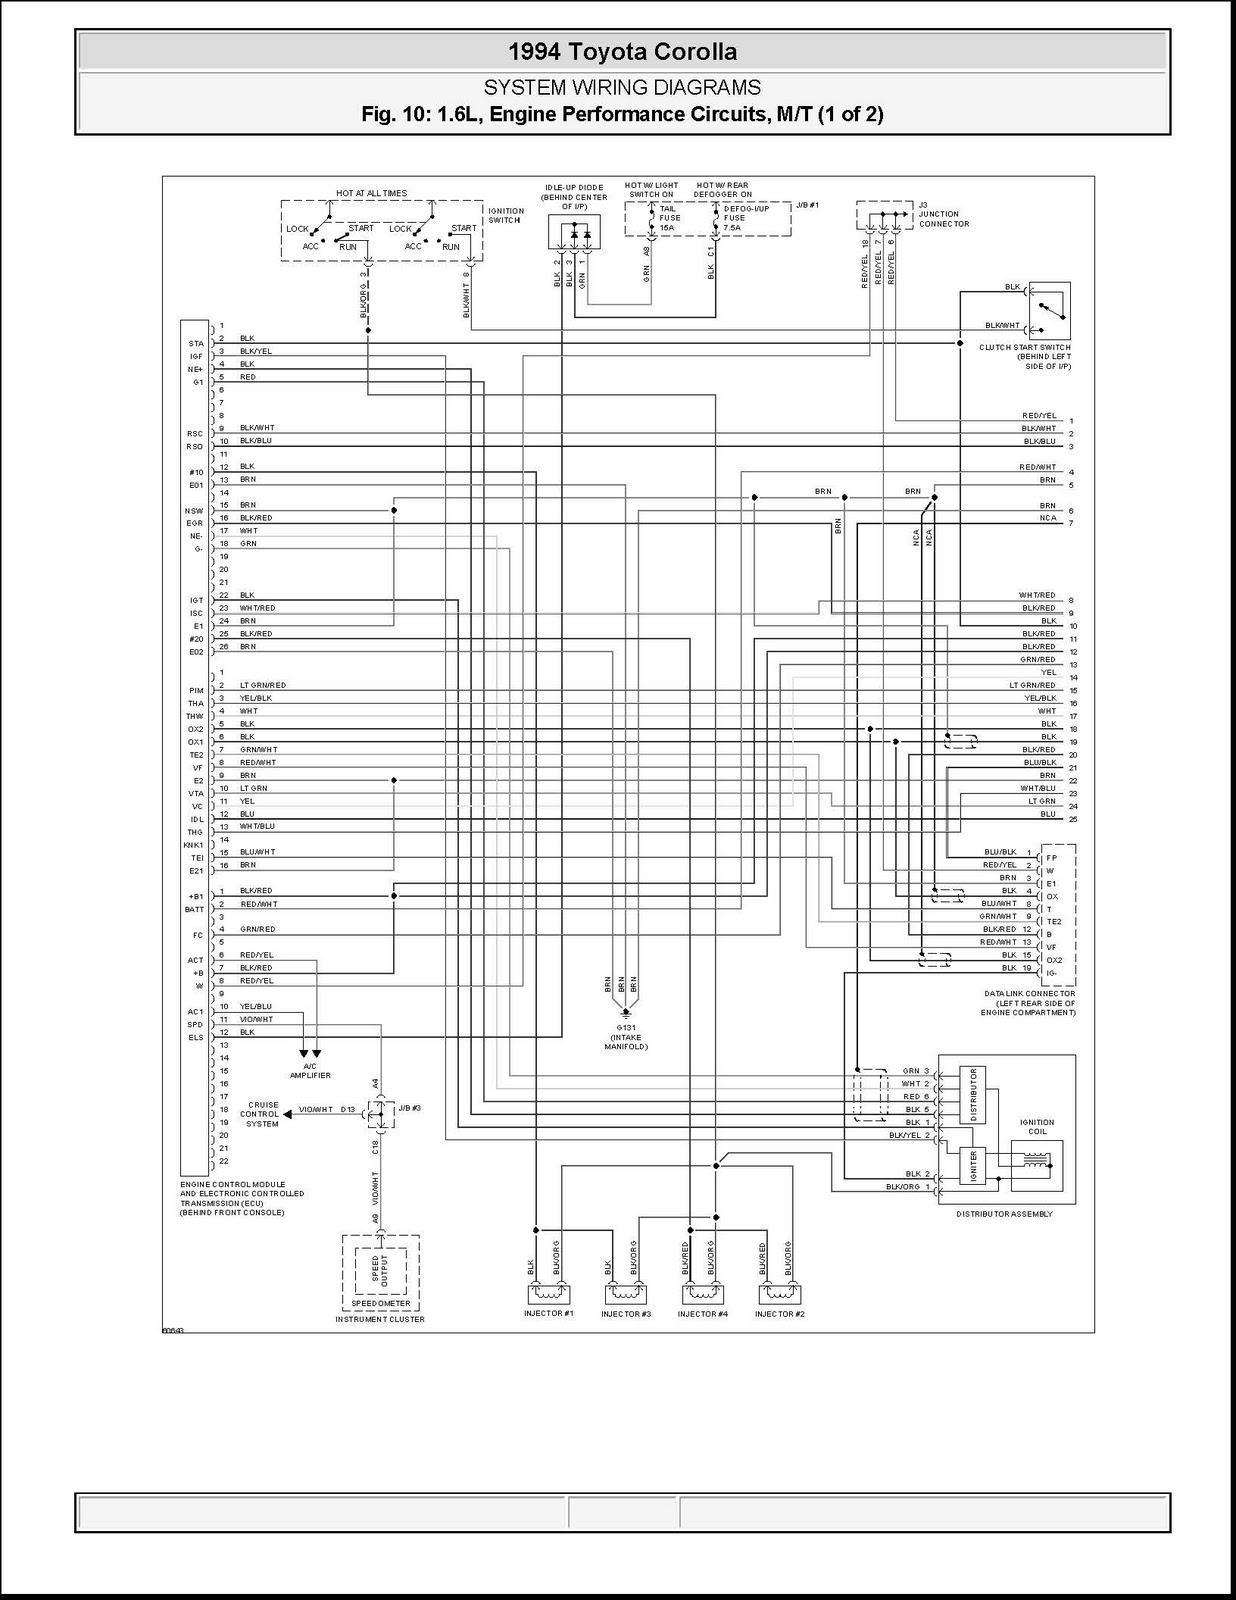 1994 Toyota Corolla Ecu Wiring Diagram - Wiring Diagram